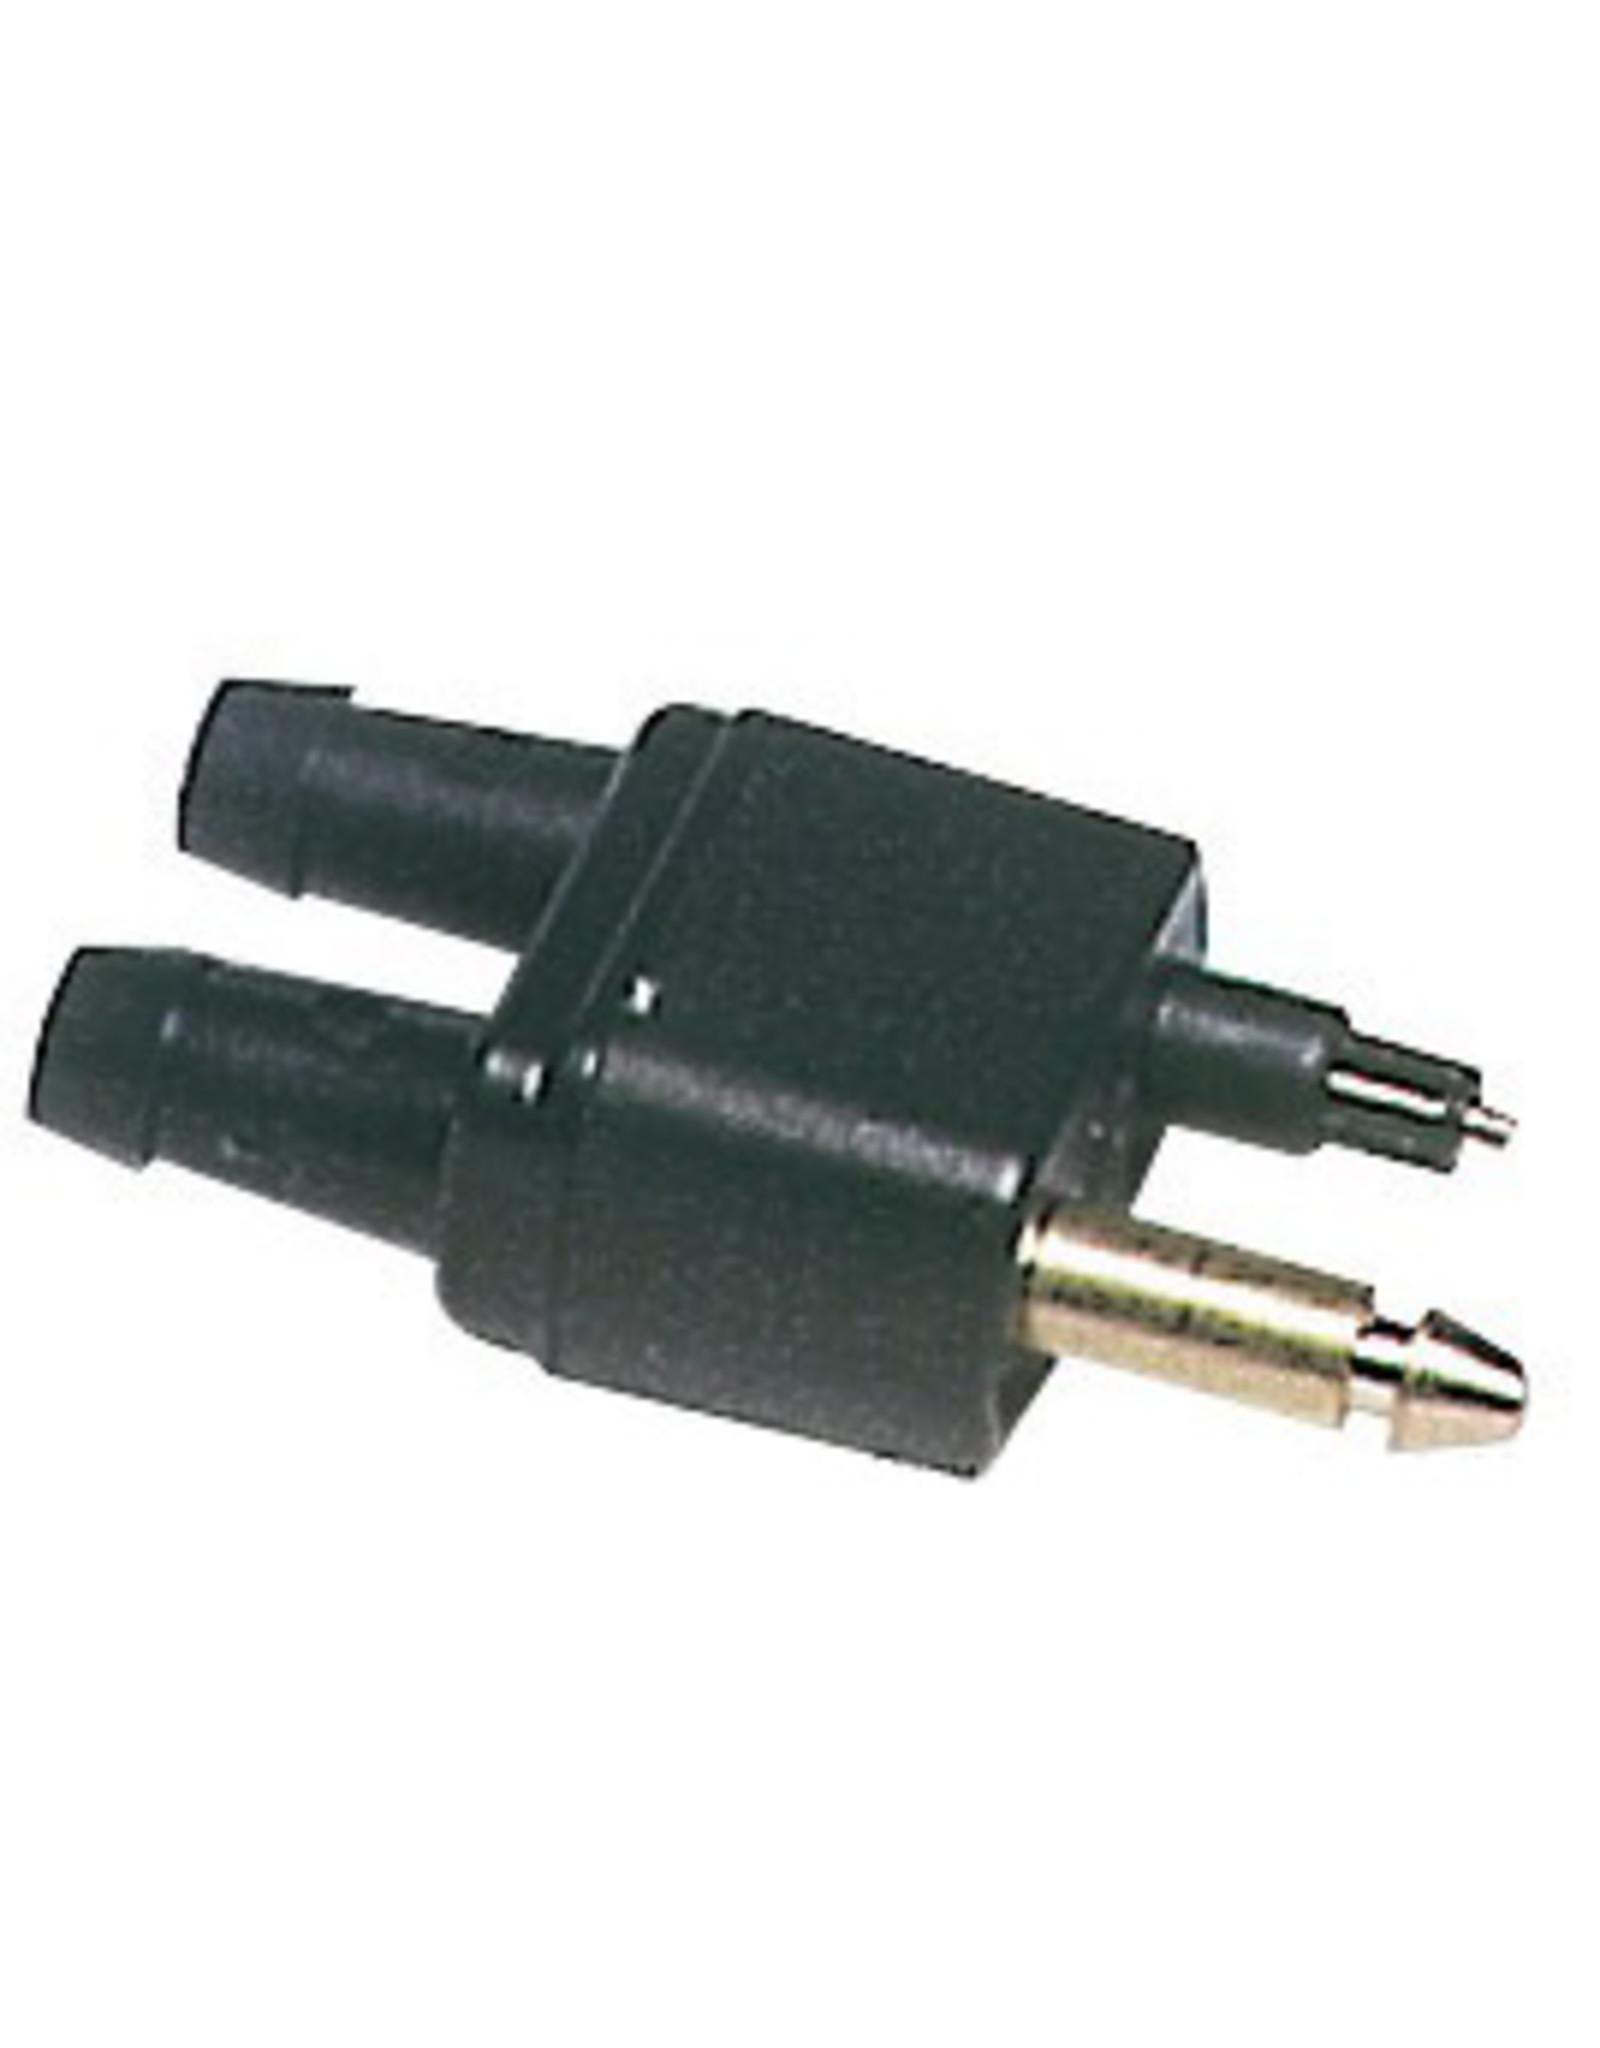 Osculati Johnson / Evinrude benzine connector los